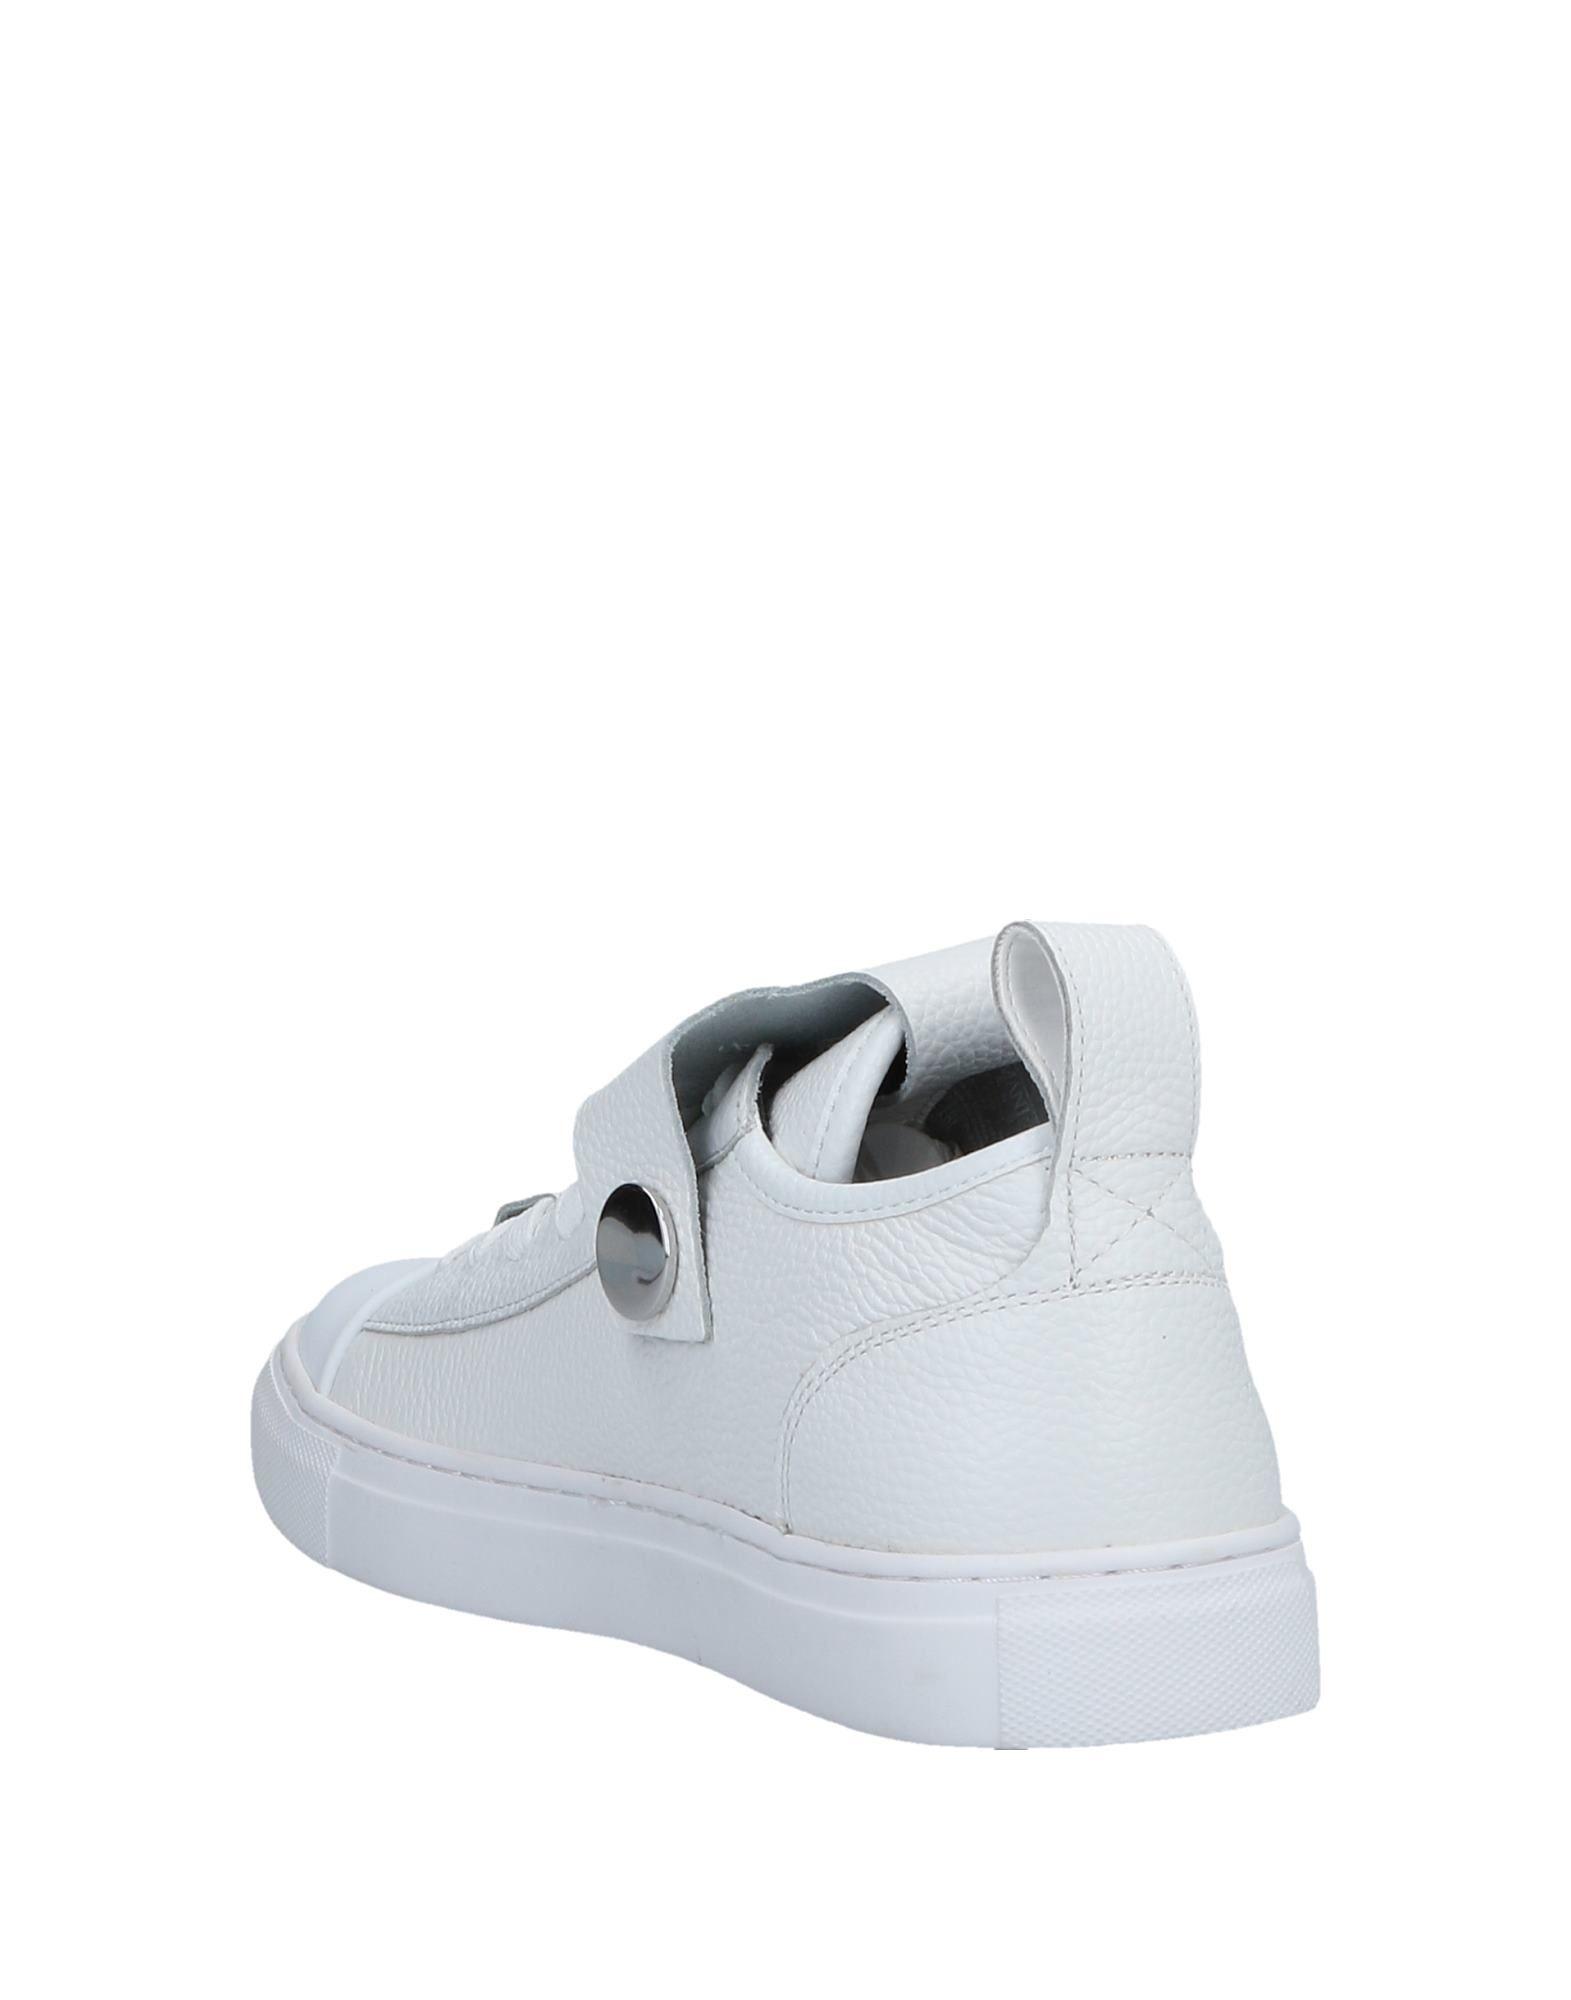 Gut um billige Schuhe zu tragenArmani 11517057VW Jeans Sneakers Damen  11517057VW tragenArmani b7f2d7